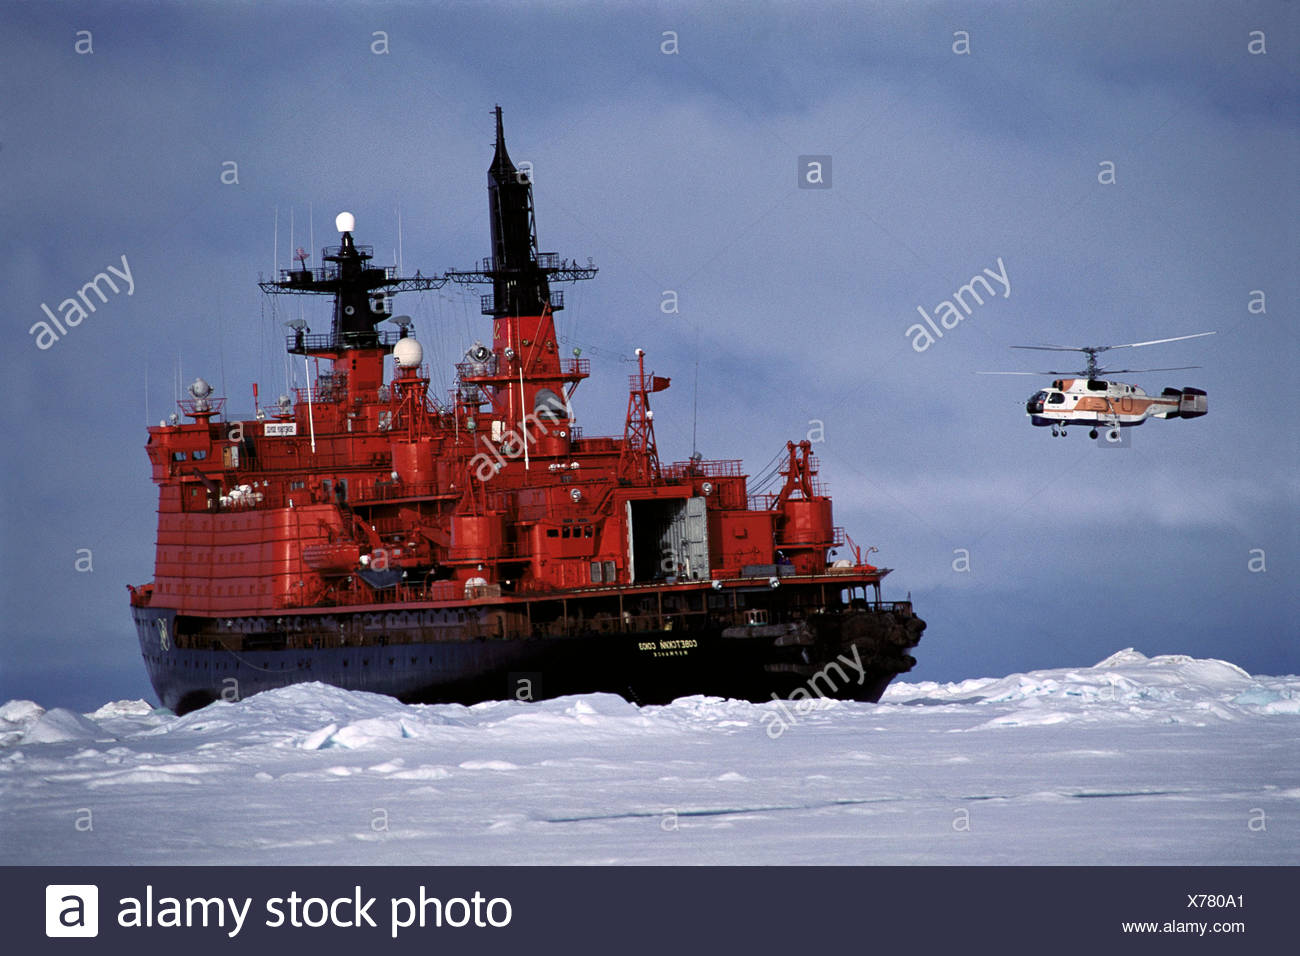 Sovetskiy Soyuz nuclear powered icebreaker. North Pole - Stock Image